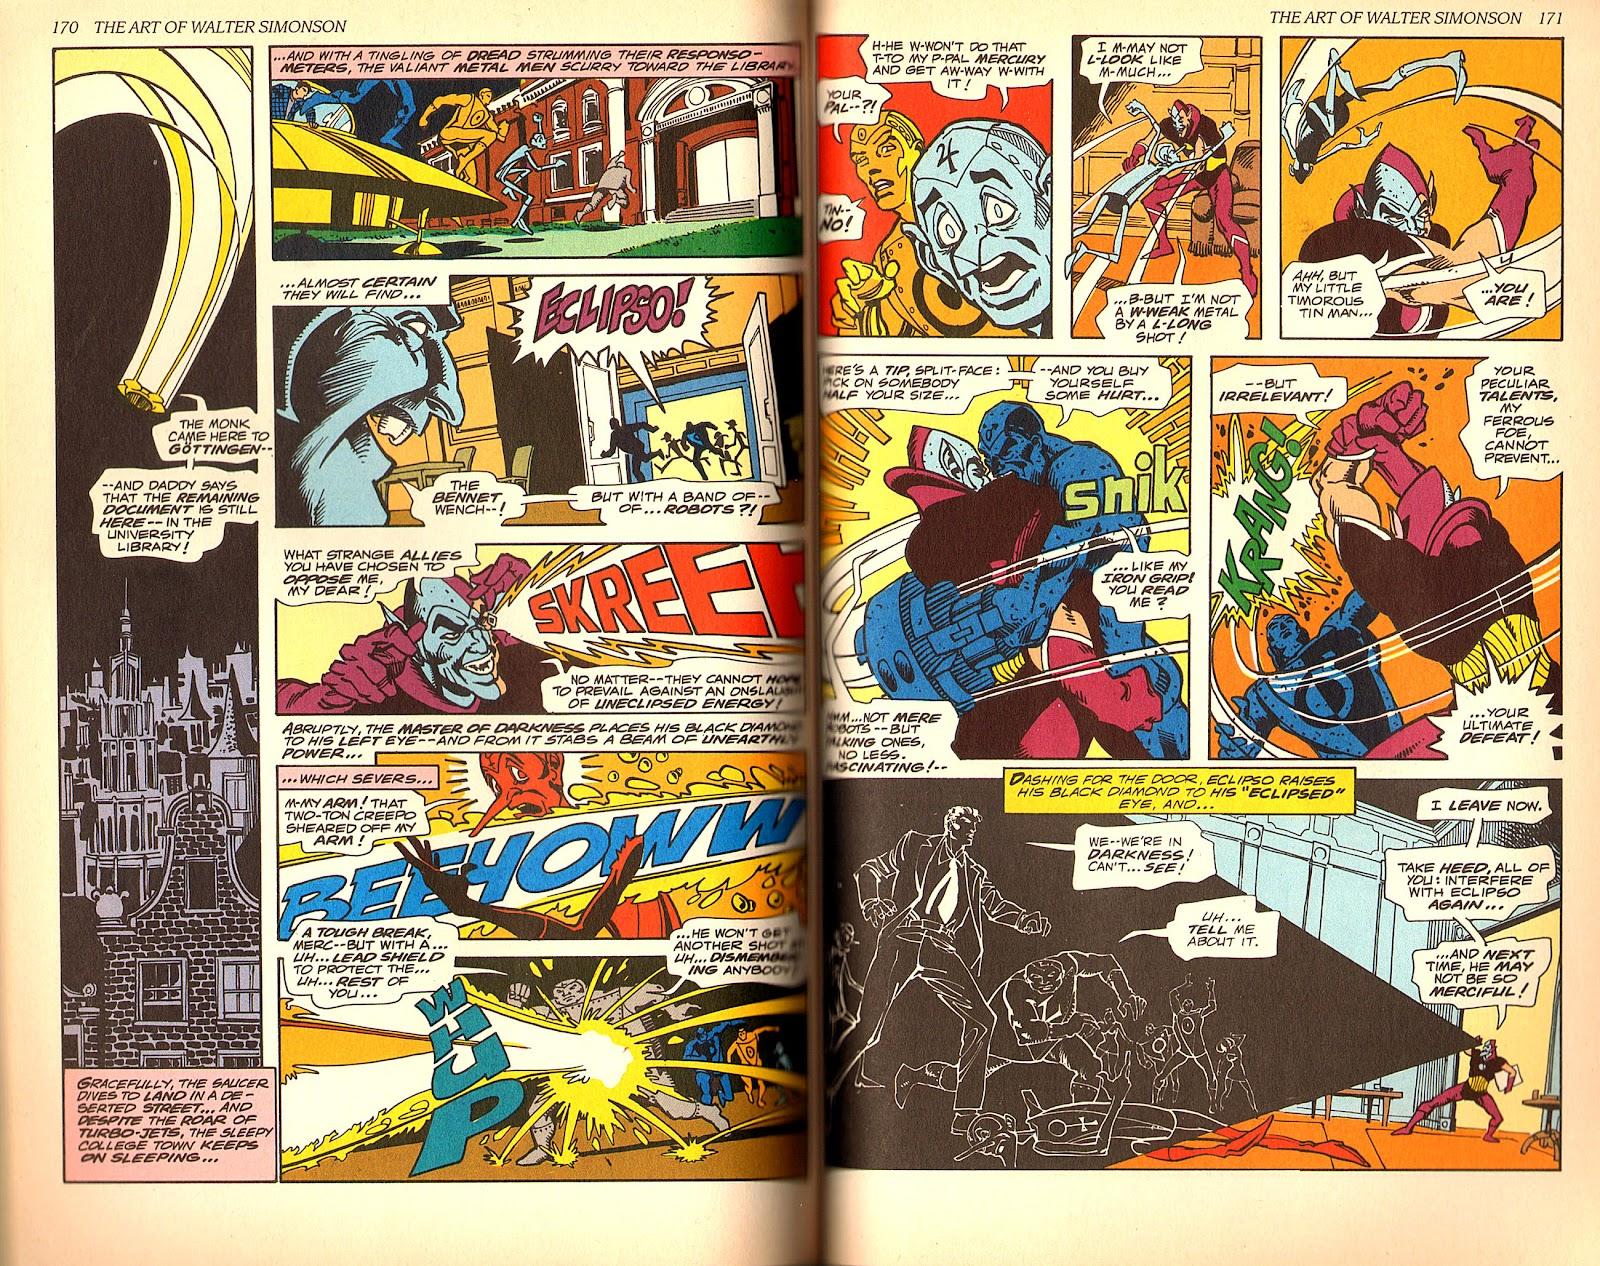 Read online The Art of Walter Simonson comic -  Issue # TPB - 87